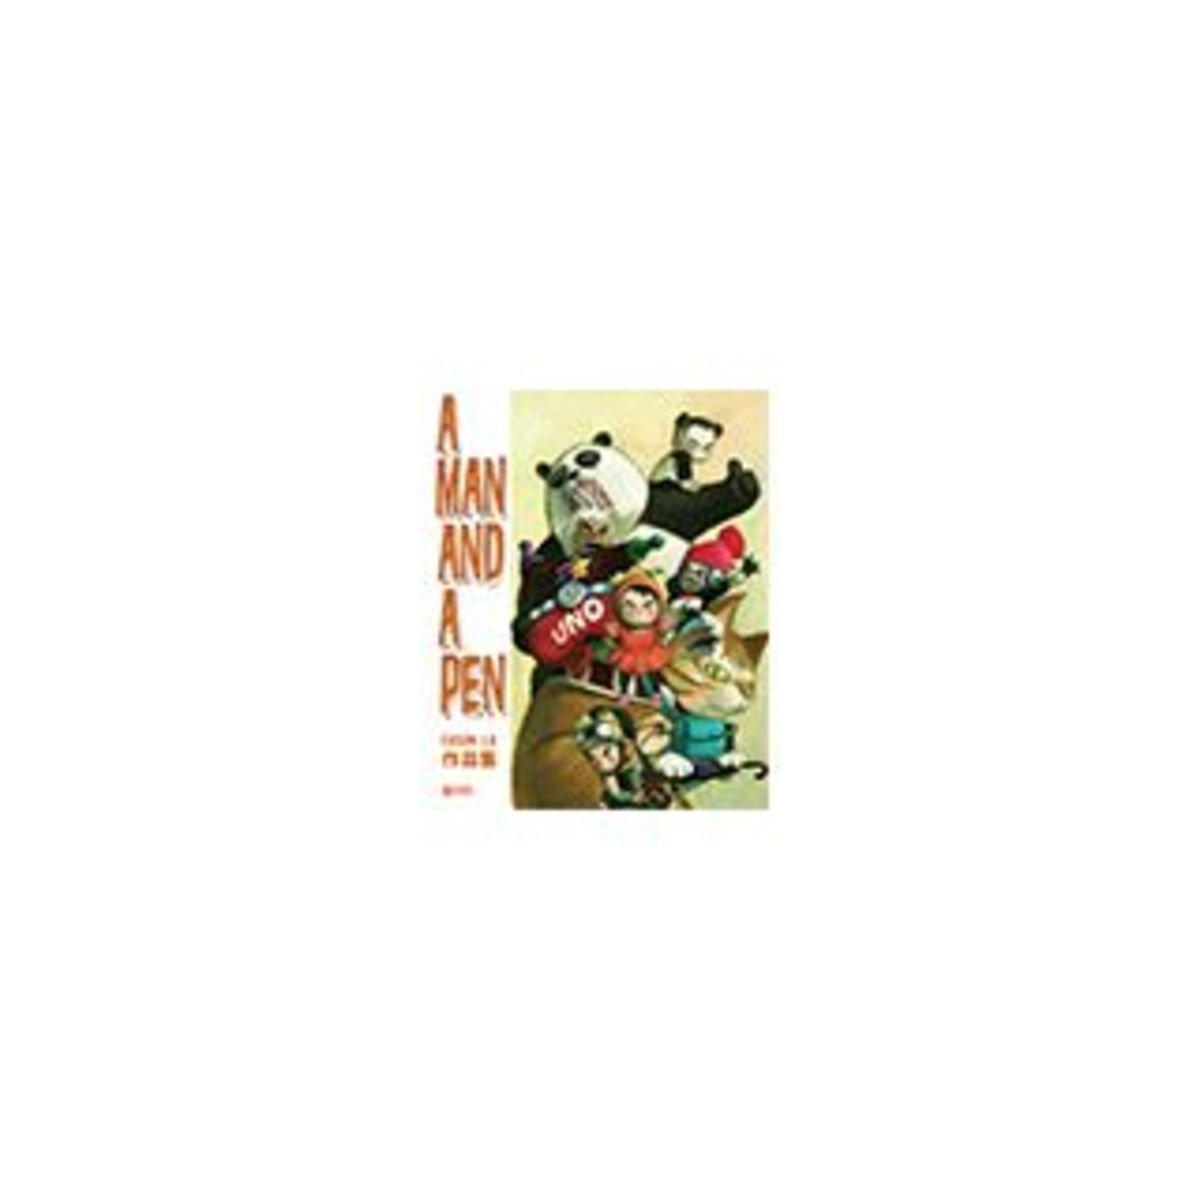 A MAN AND A PEN——Cuson Lo作品集